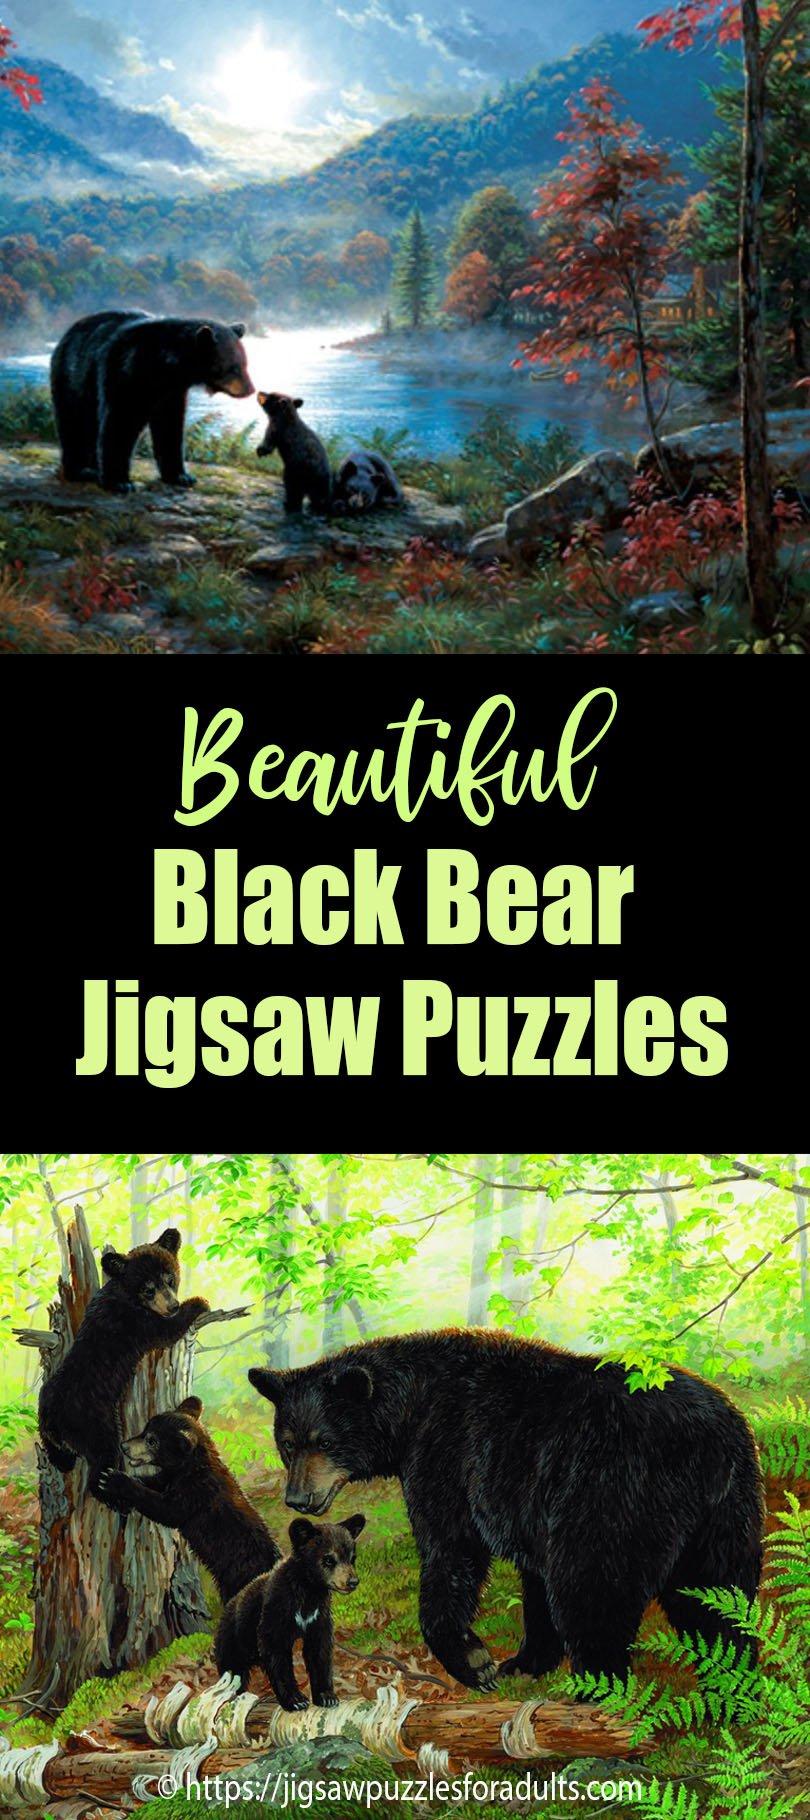 Black Bear Puzzles